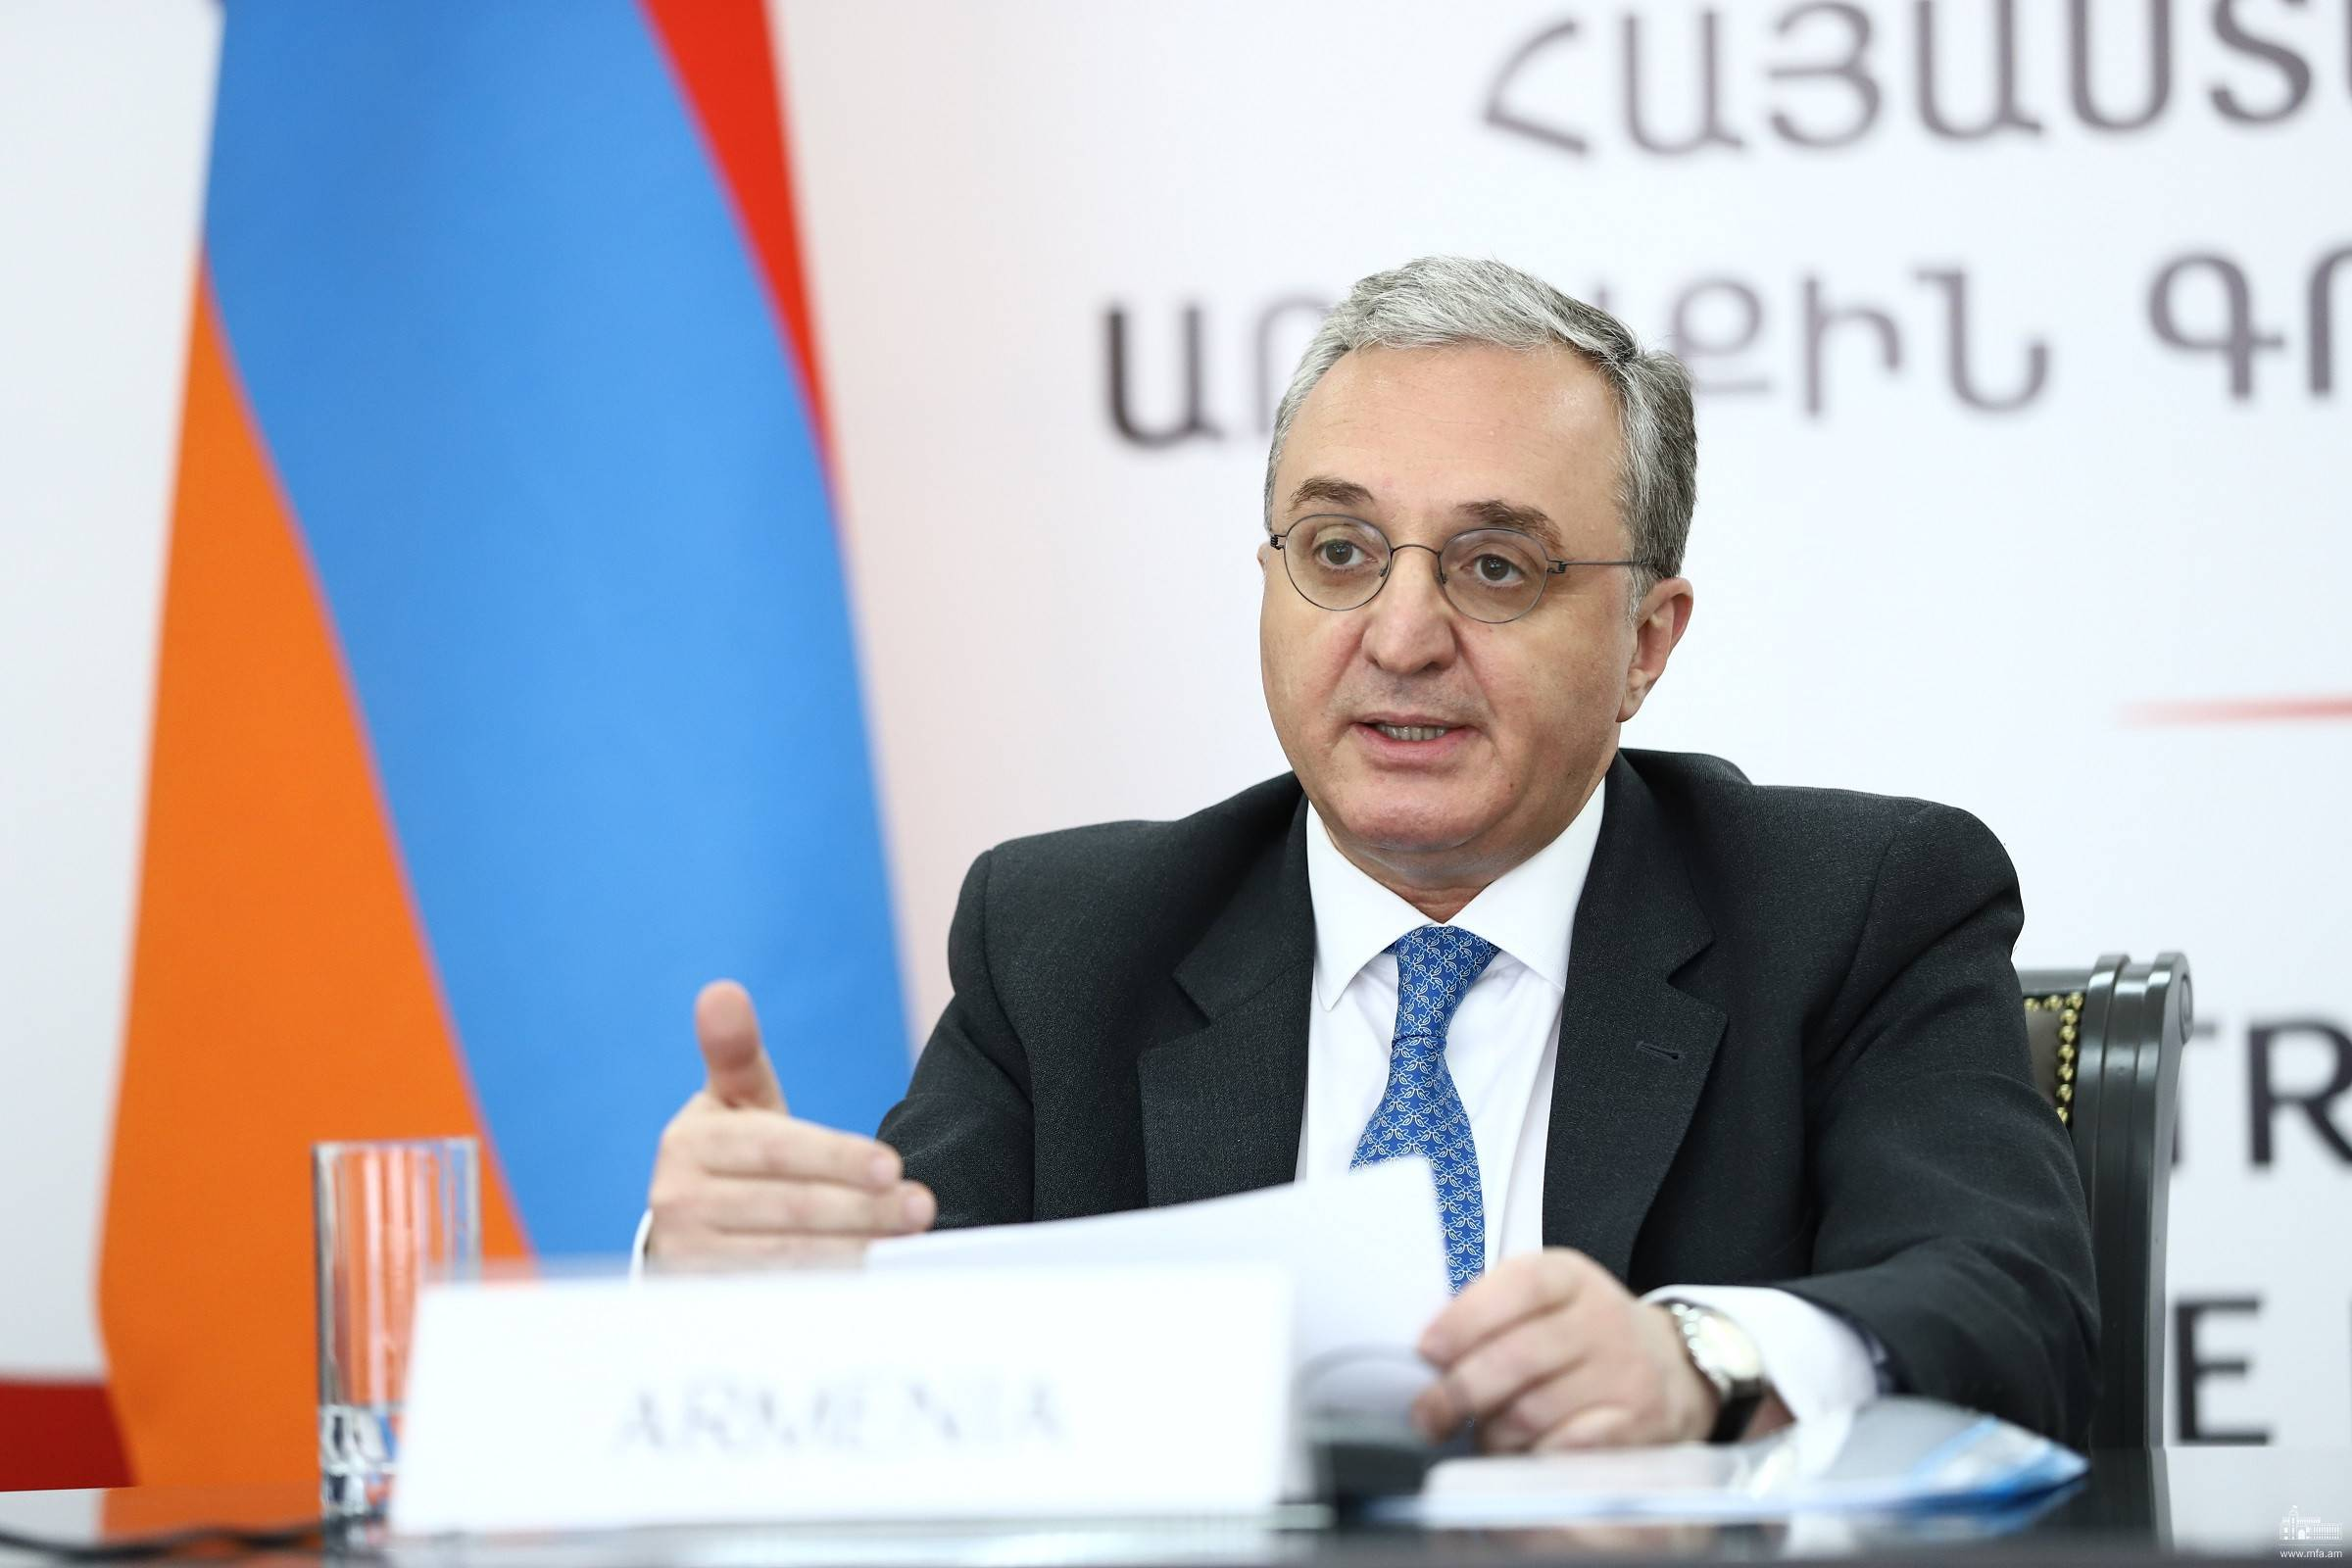 Photo of ՀՀ ԱԳ նախարար Զոհրաբ Մնացականյանի ելույթը նախարարական հանդիպմանը